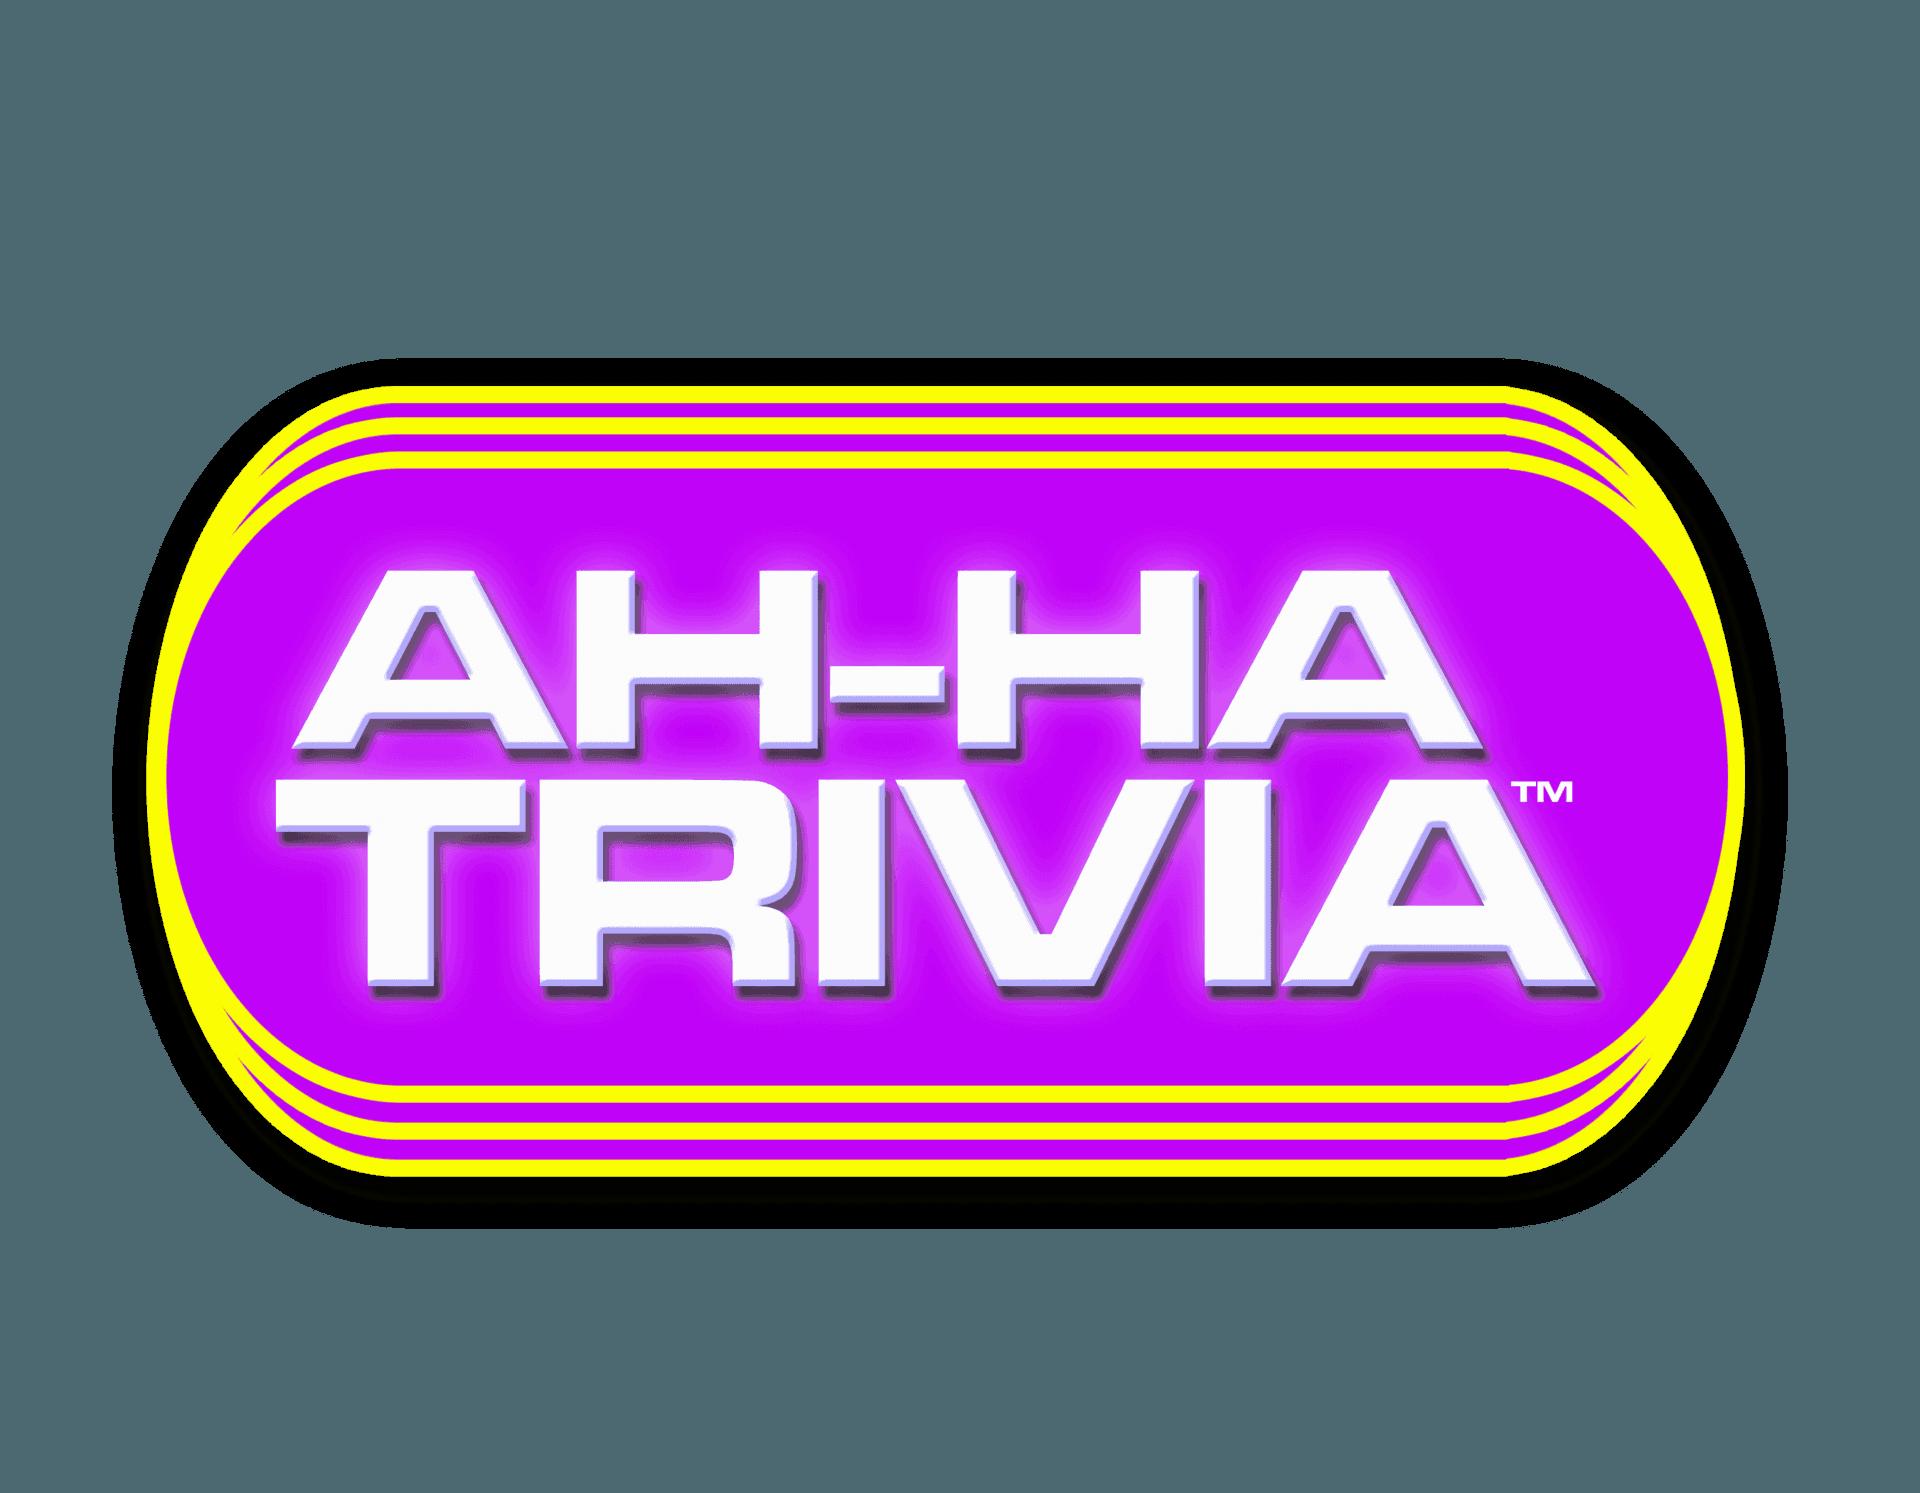 AH-HA TRIVIA - Animated Trivia LOGO World's First Animated Trivia Application